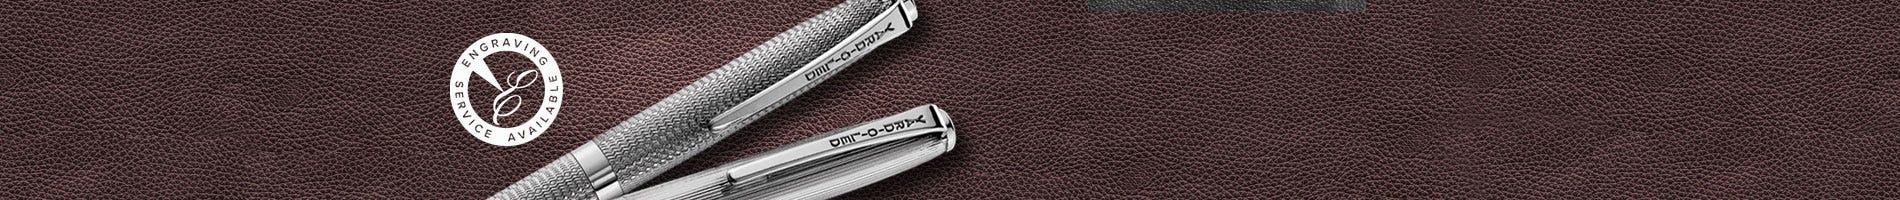 yard-o-led perfecta victorian ballpoint pen